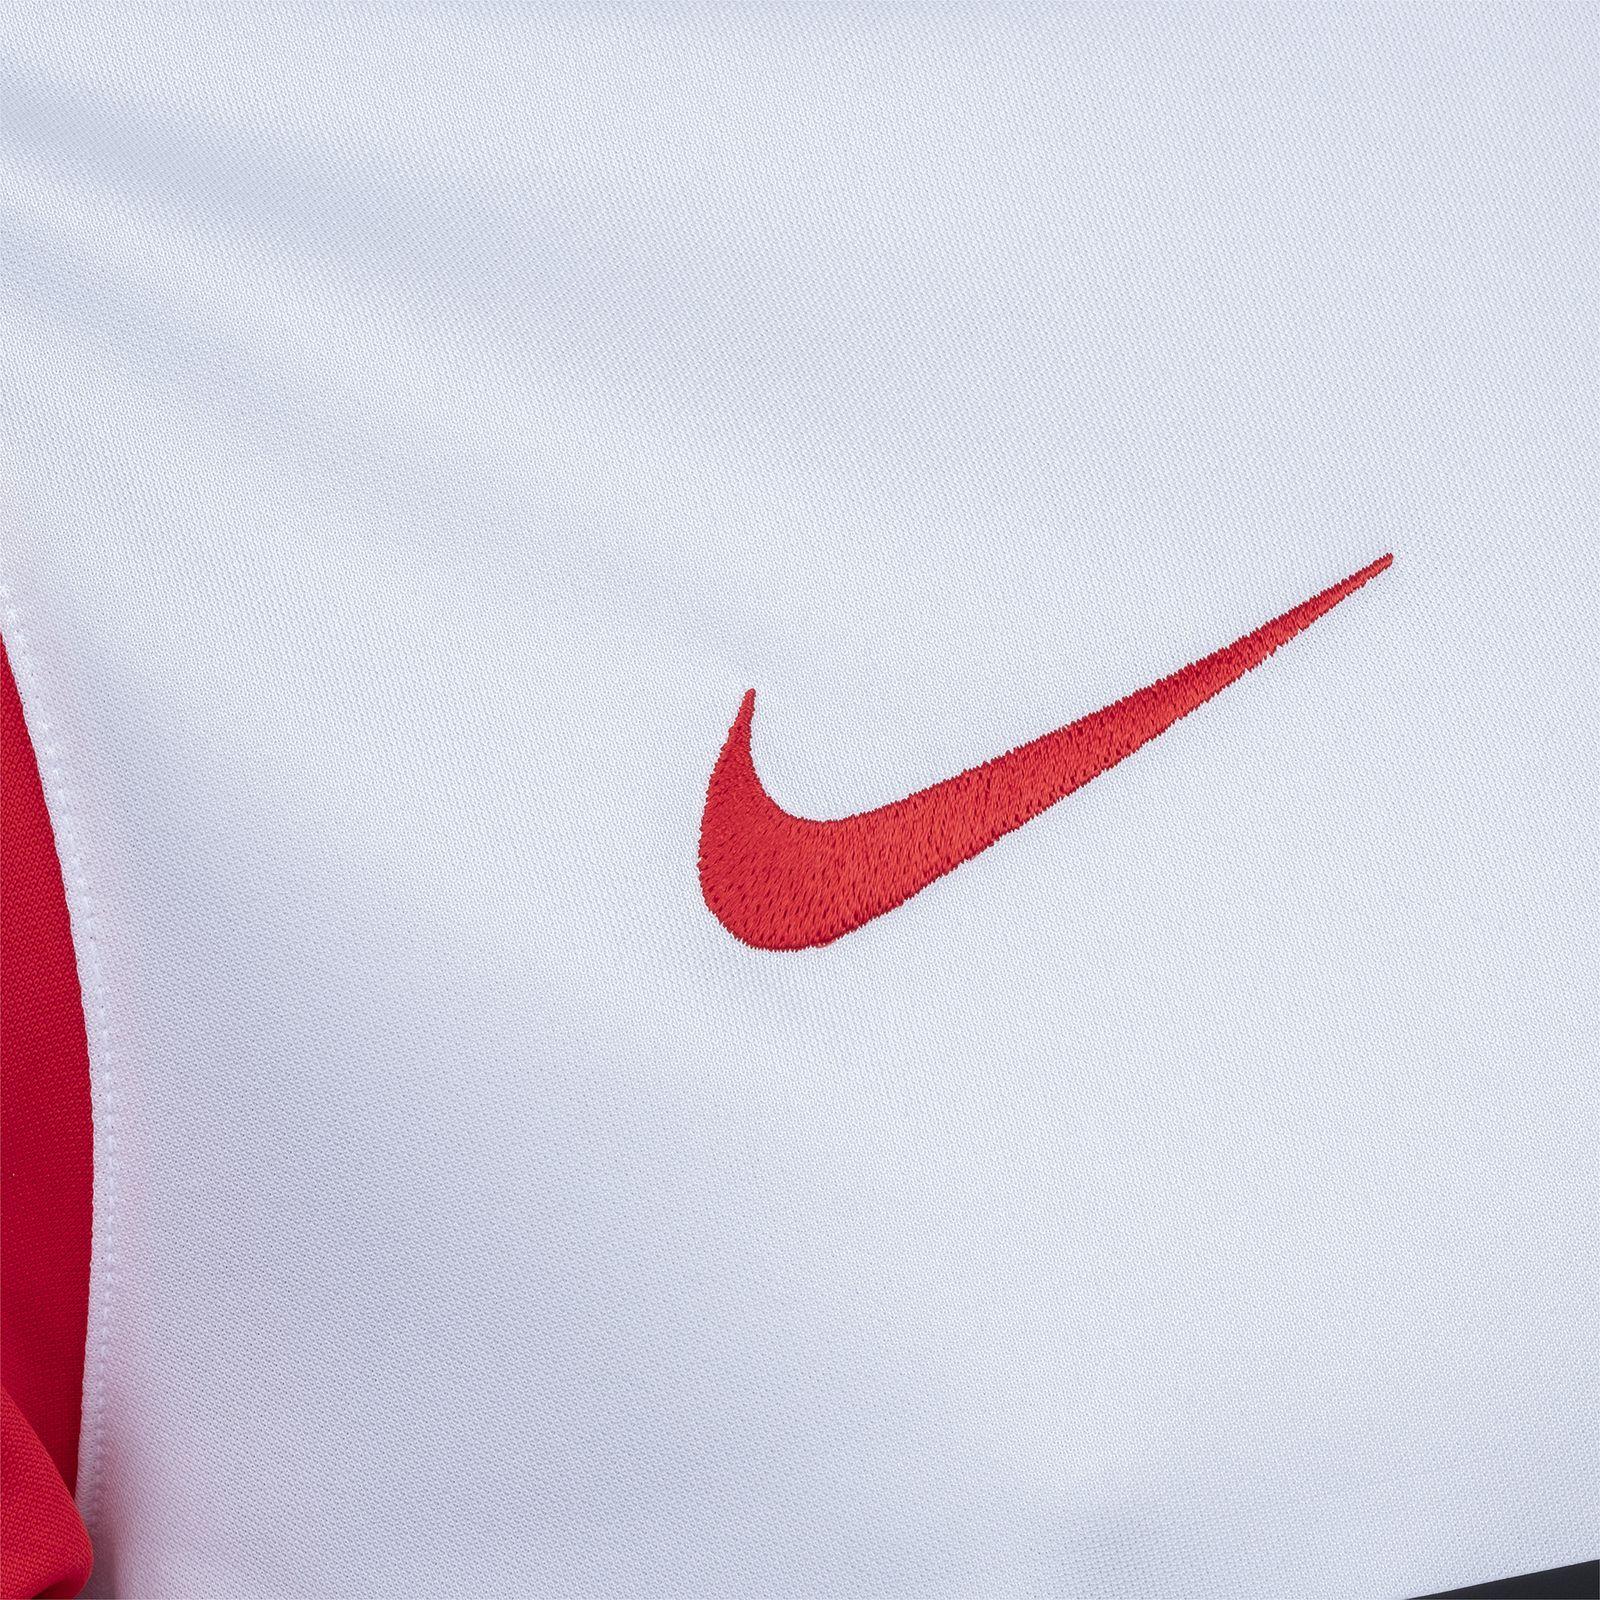 fc utrecht 2020 21 nike home kit 20 21 kits football shirt blog